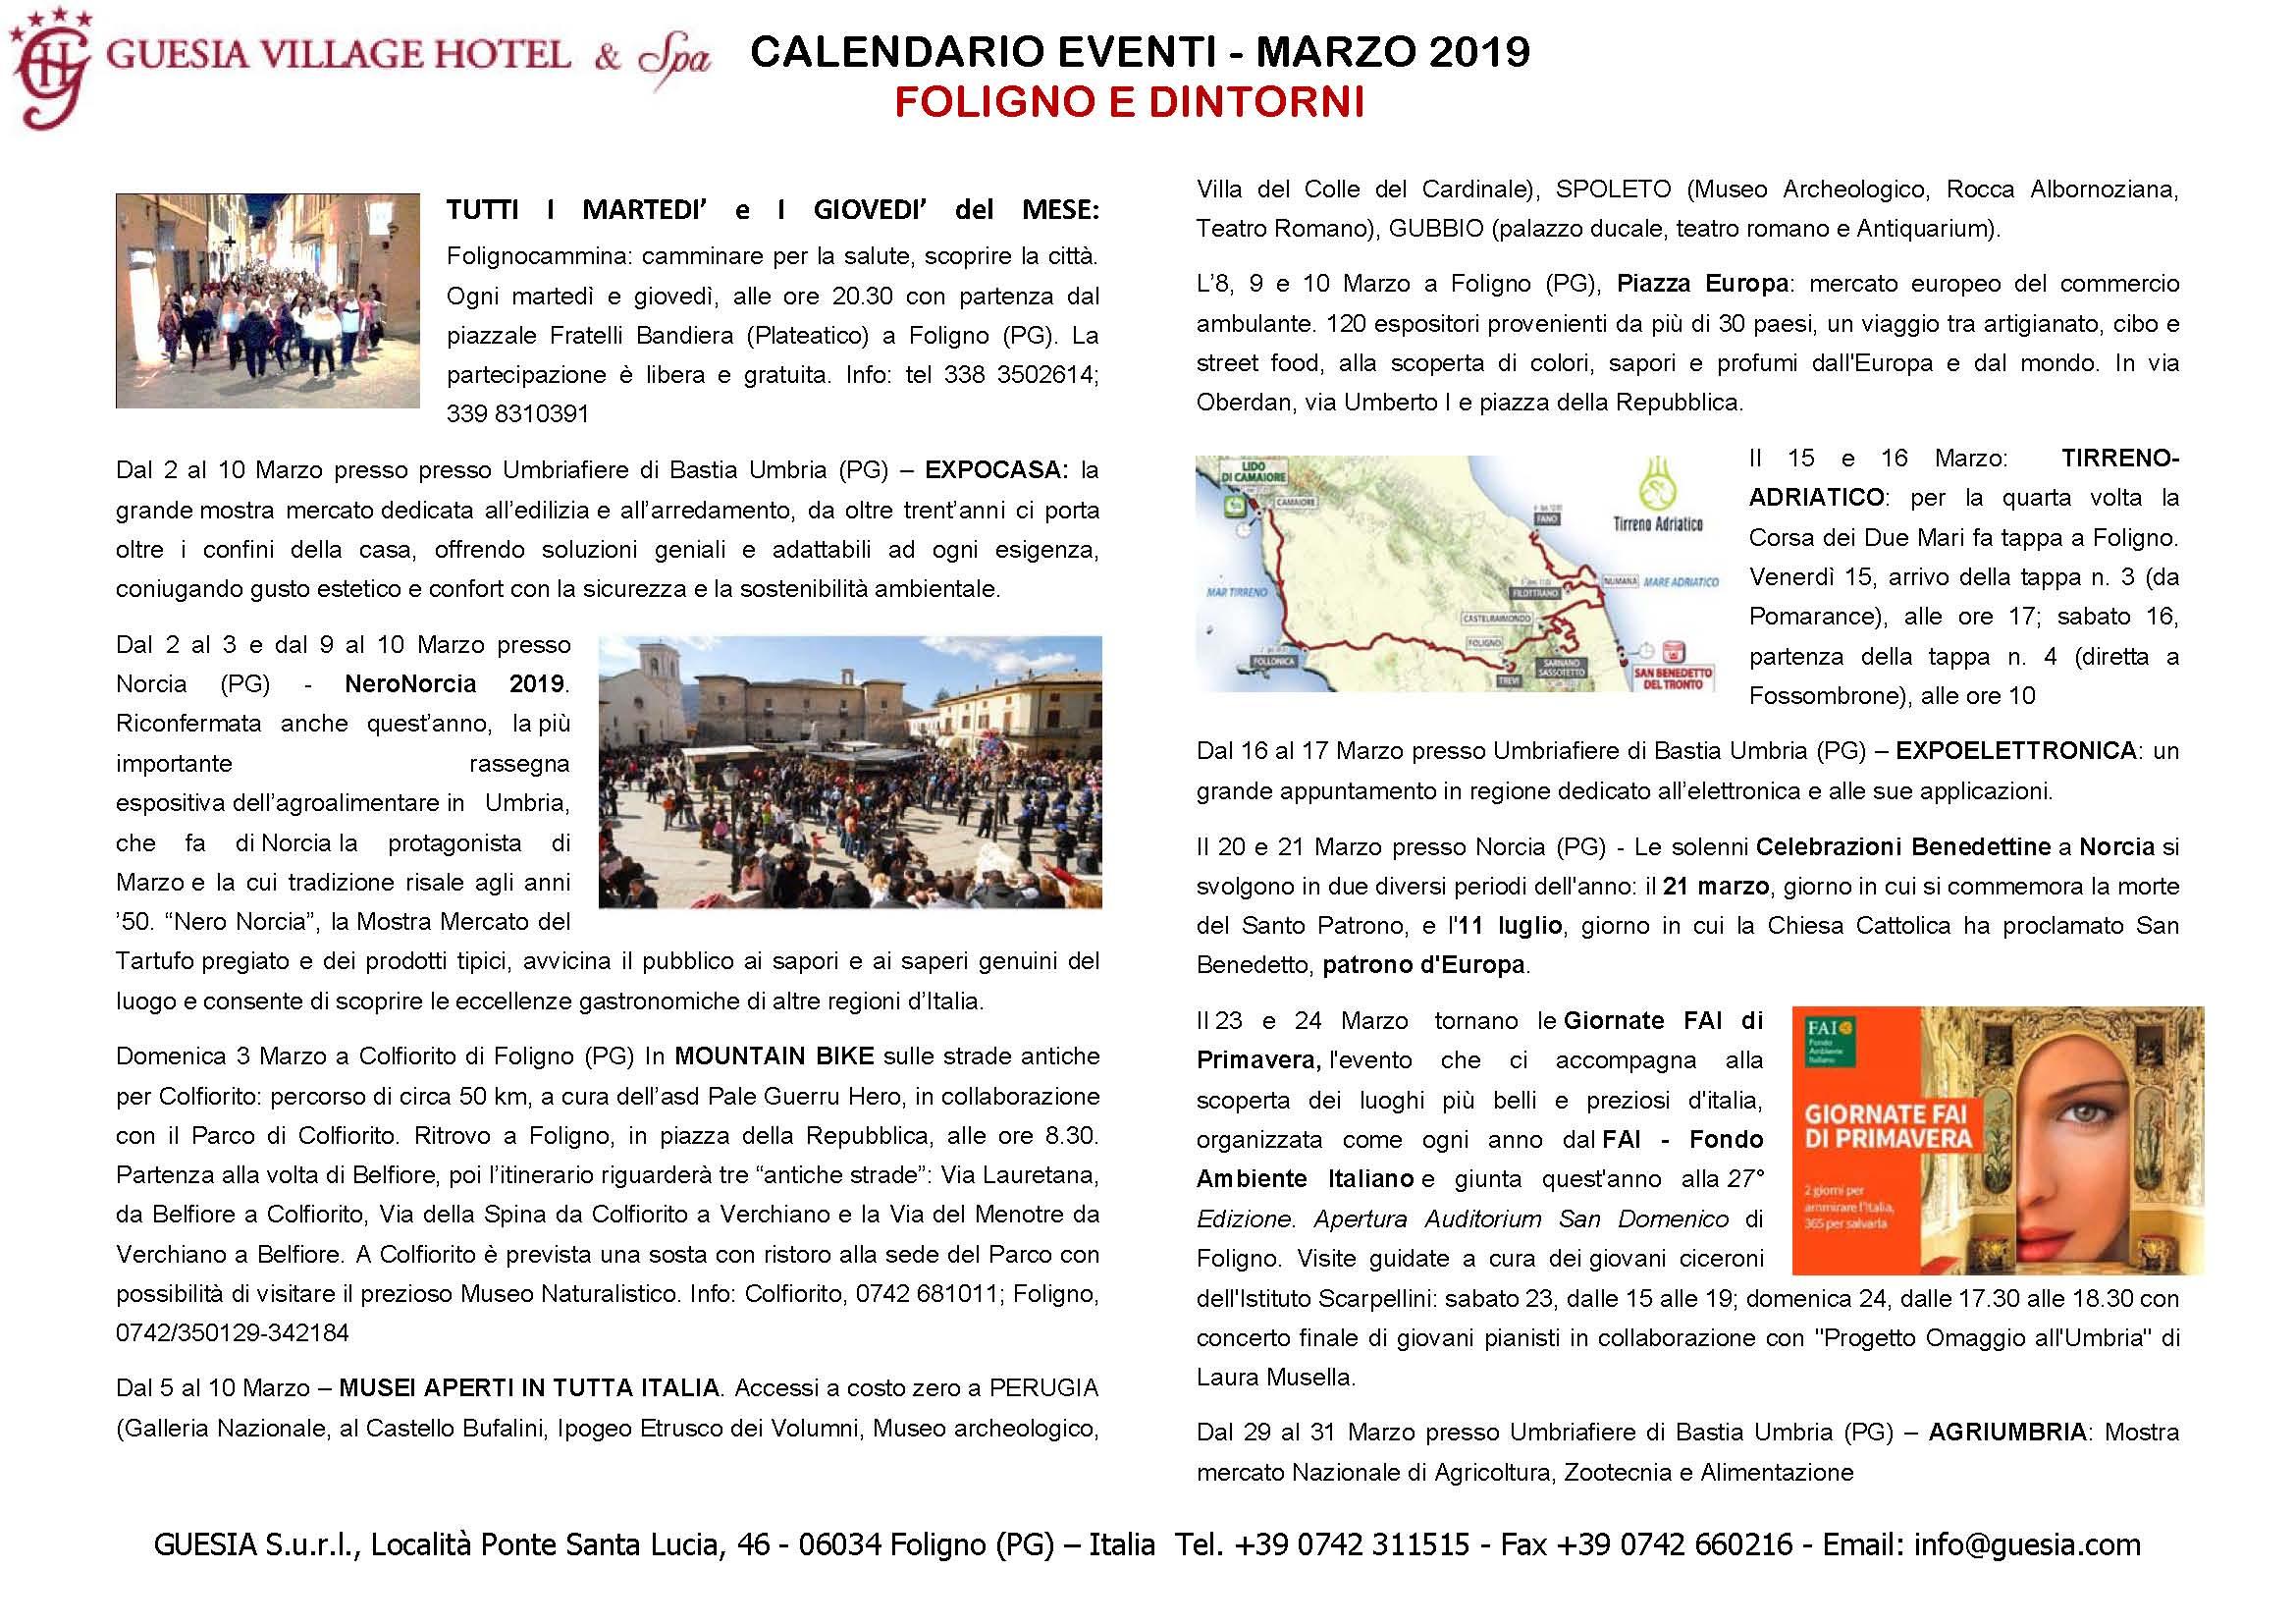 Grande Evento Calendario.Calendario Eventi In Umbria Marzo 2019 Guesia Village